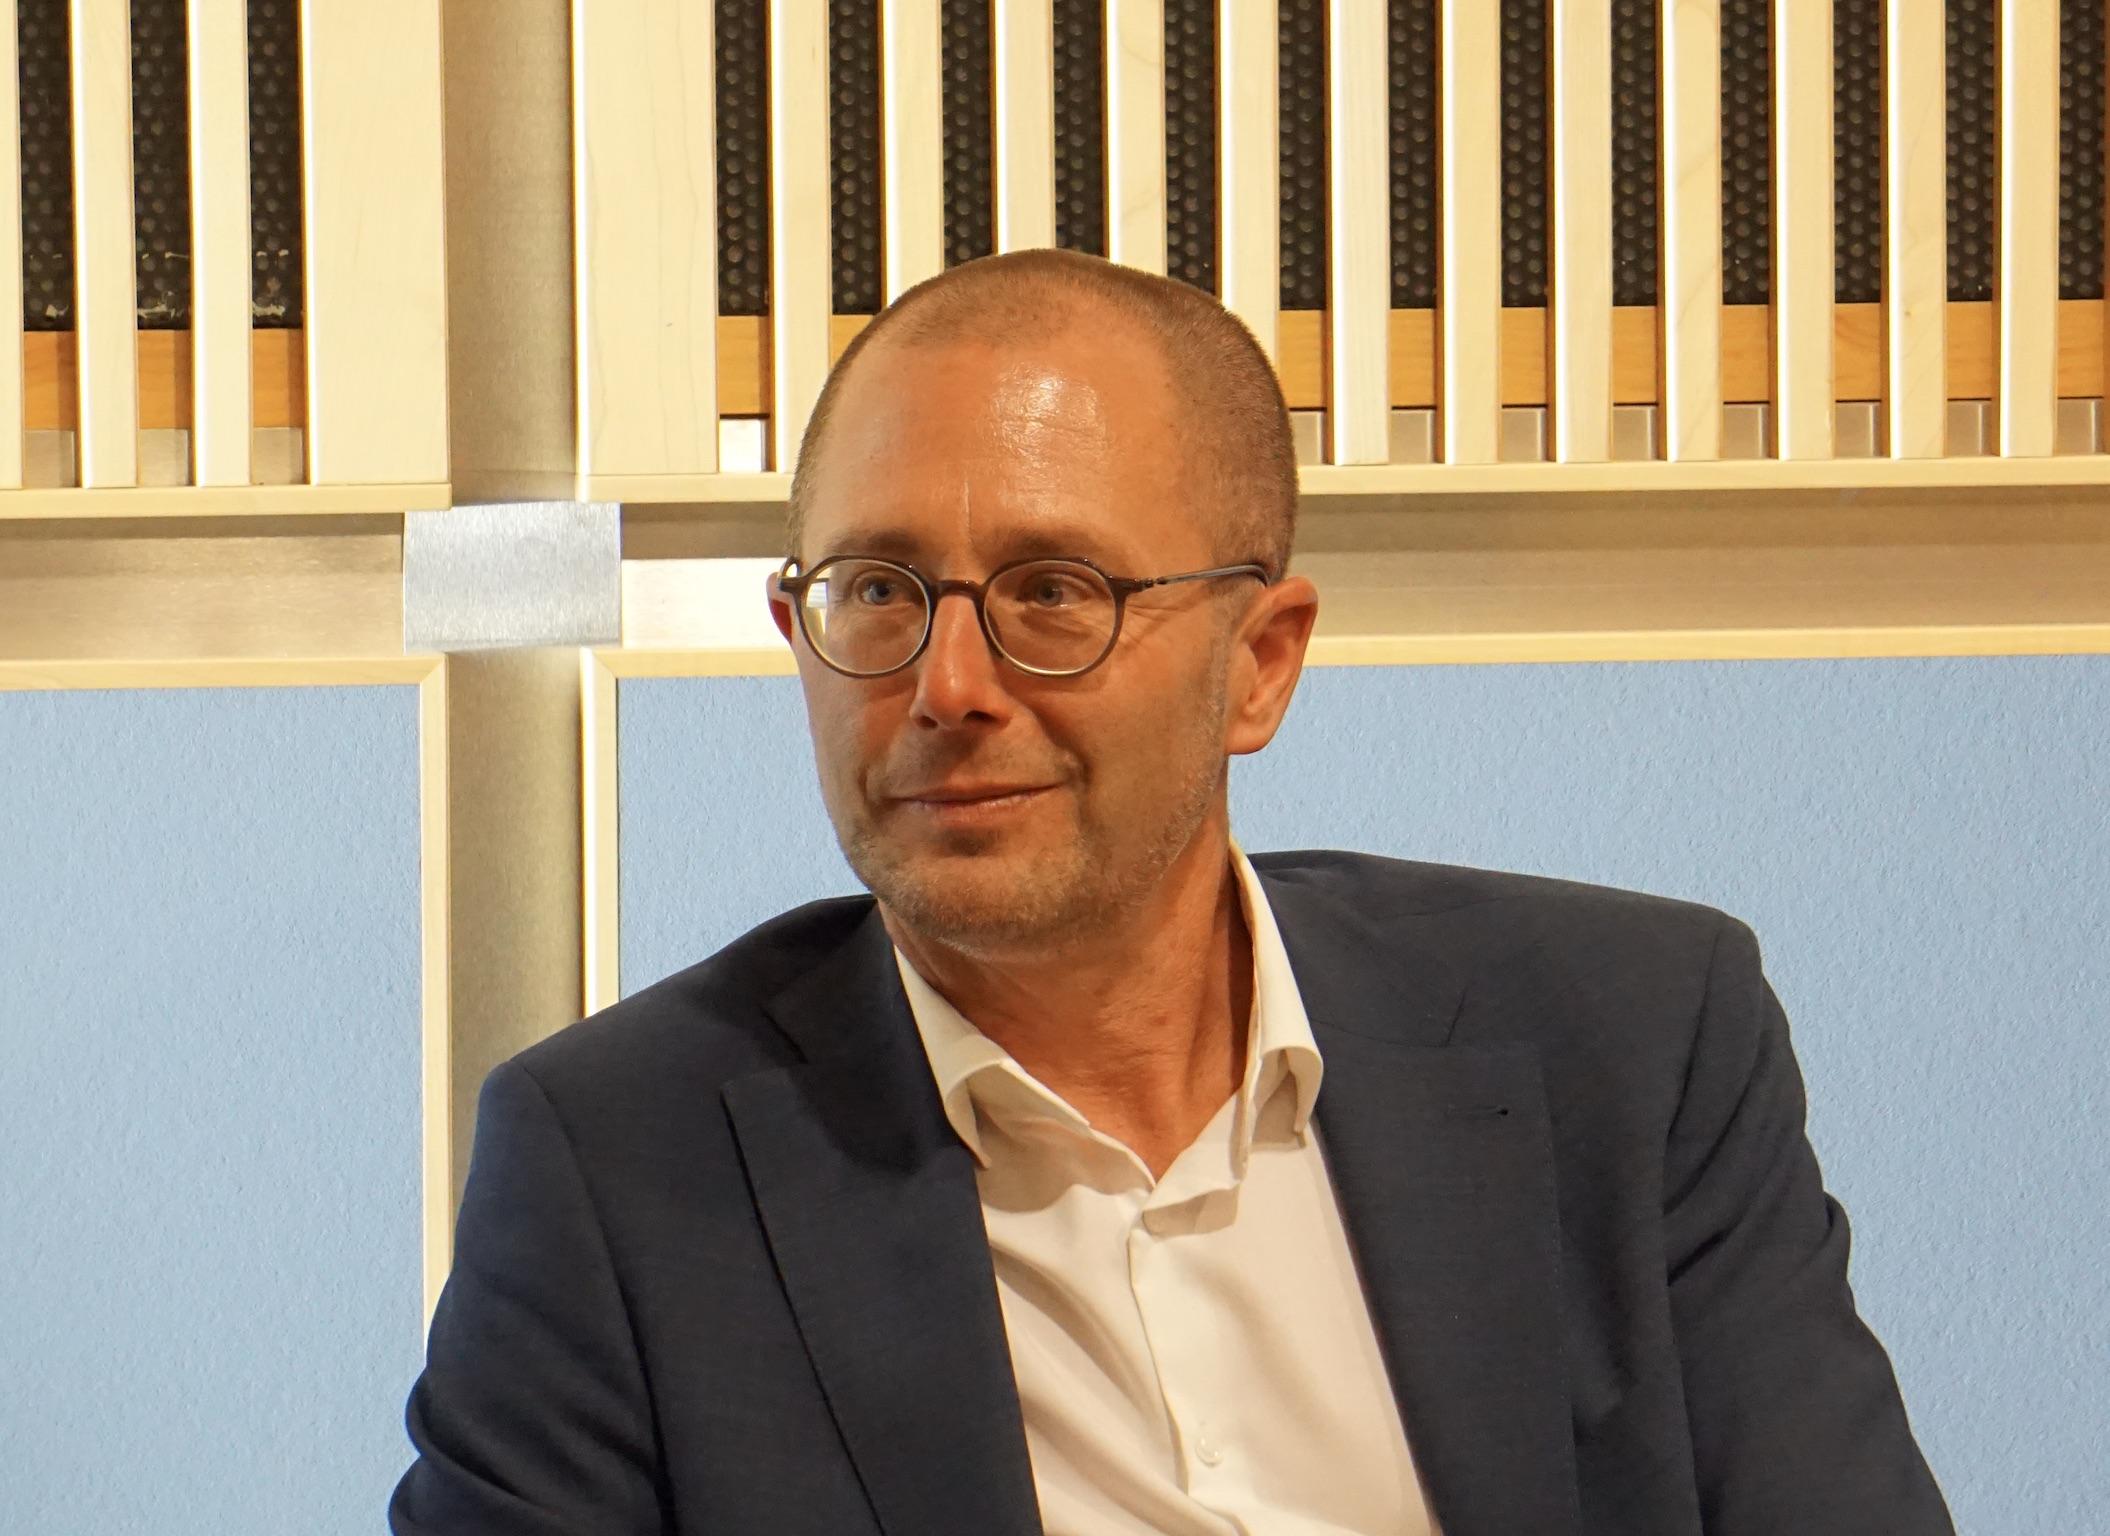 Bernhard Zauner